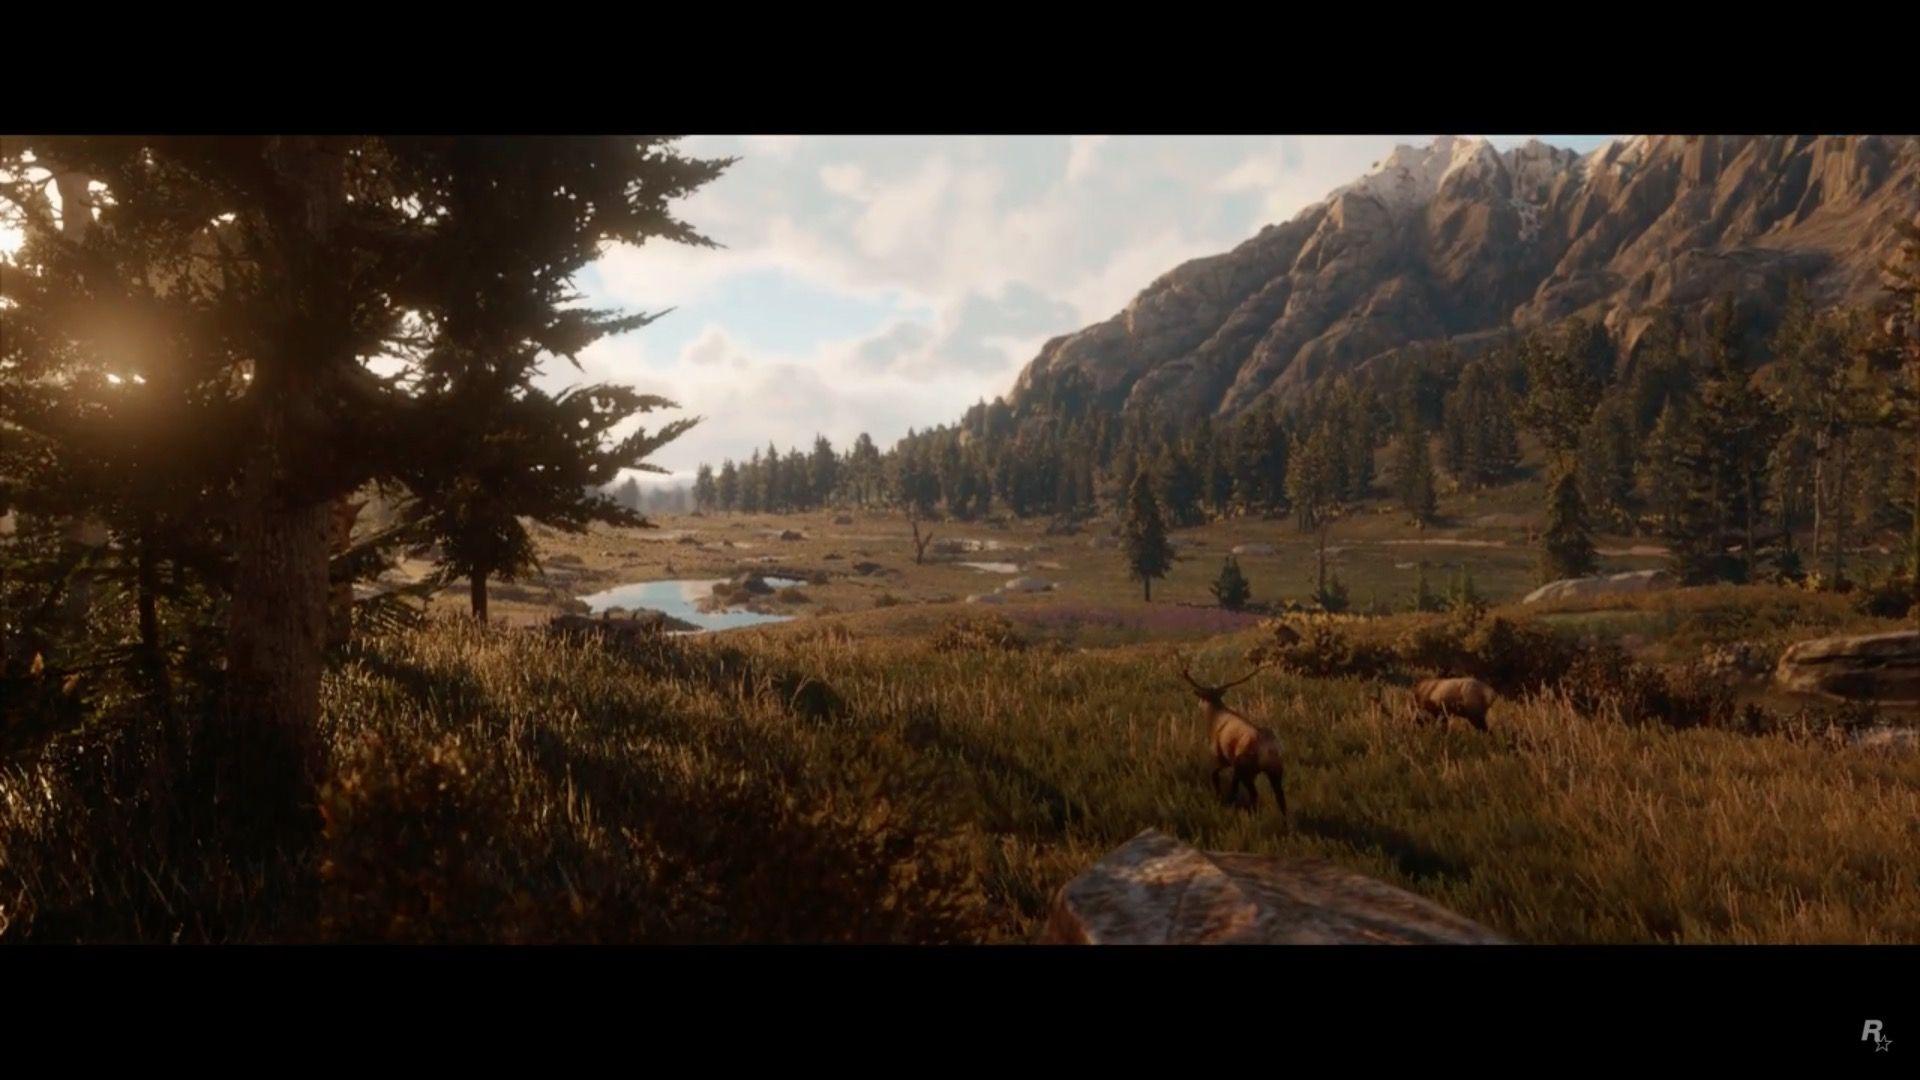 Red Dead Redemption 2 Hd Wallpapers Flip Wallpapers Download